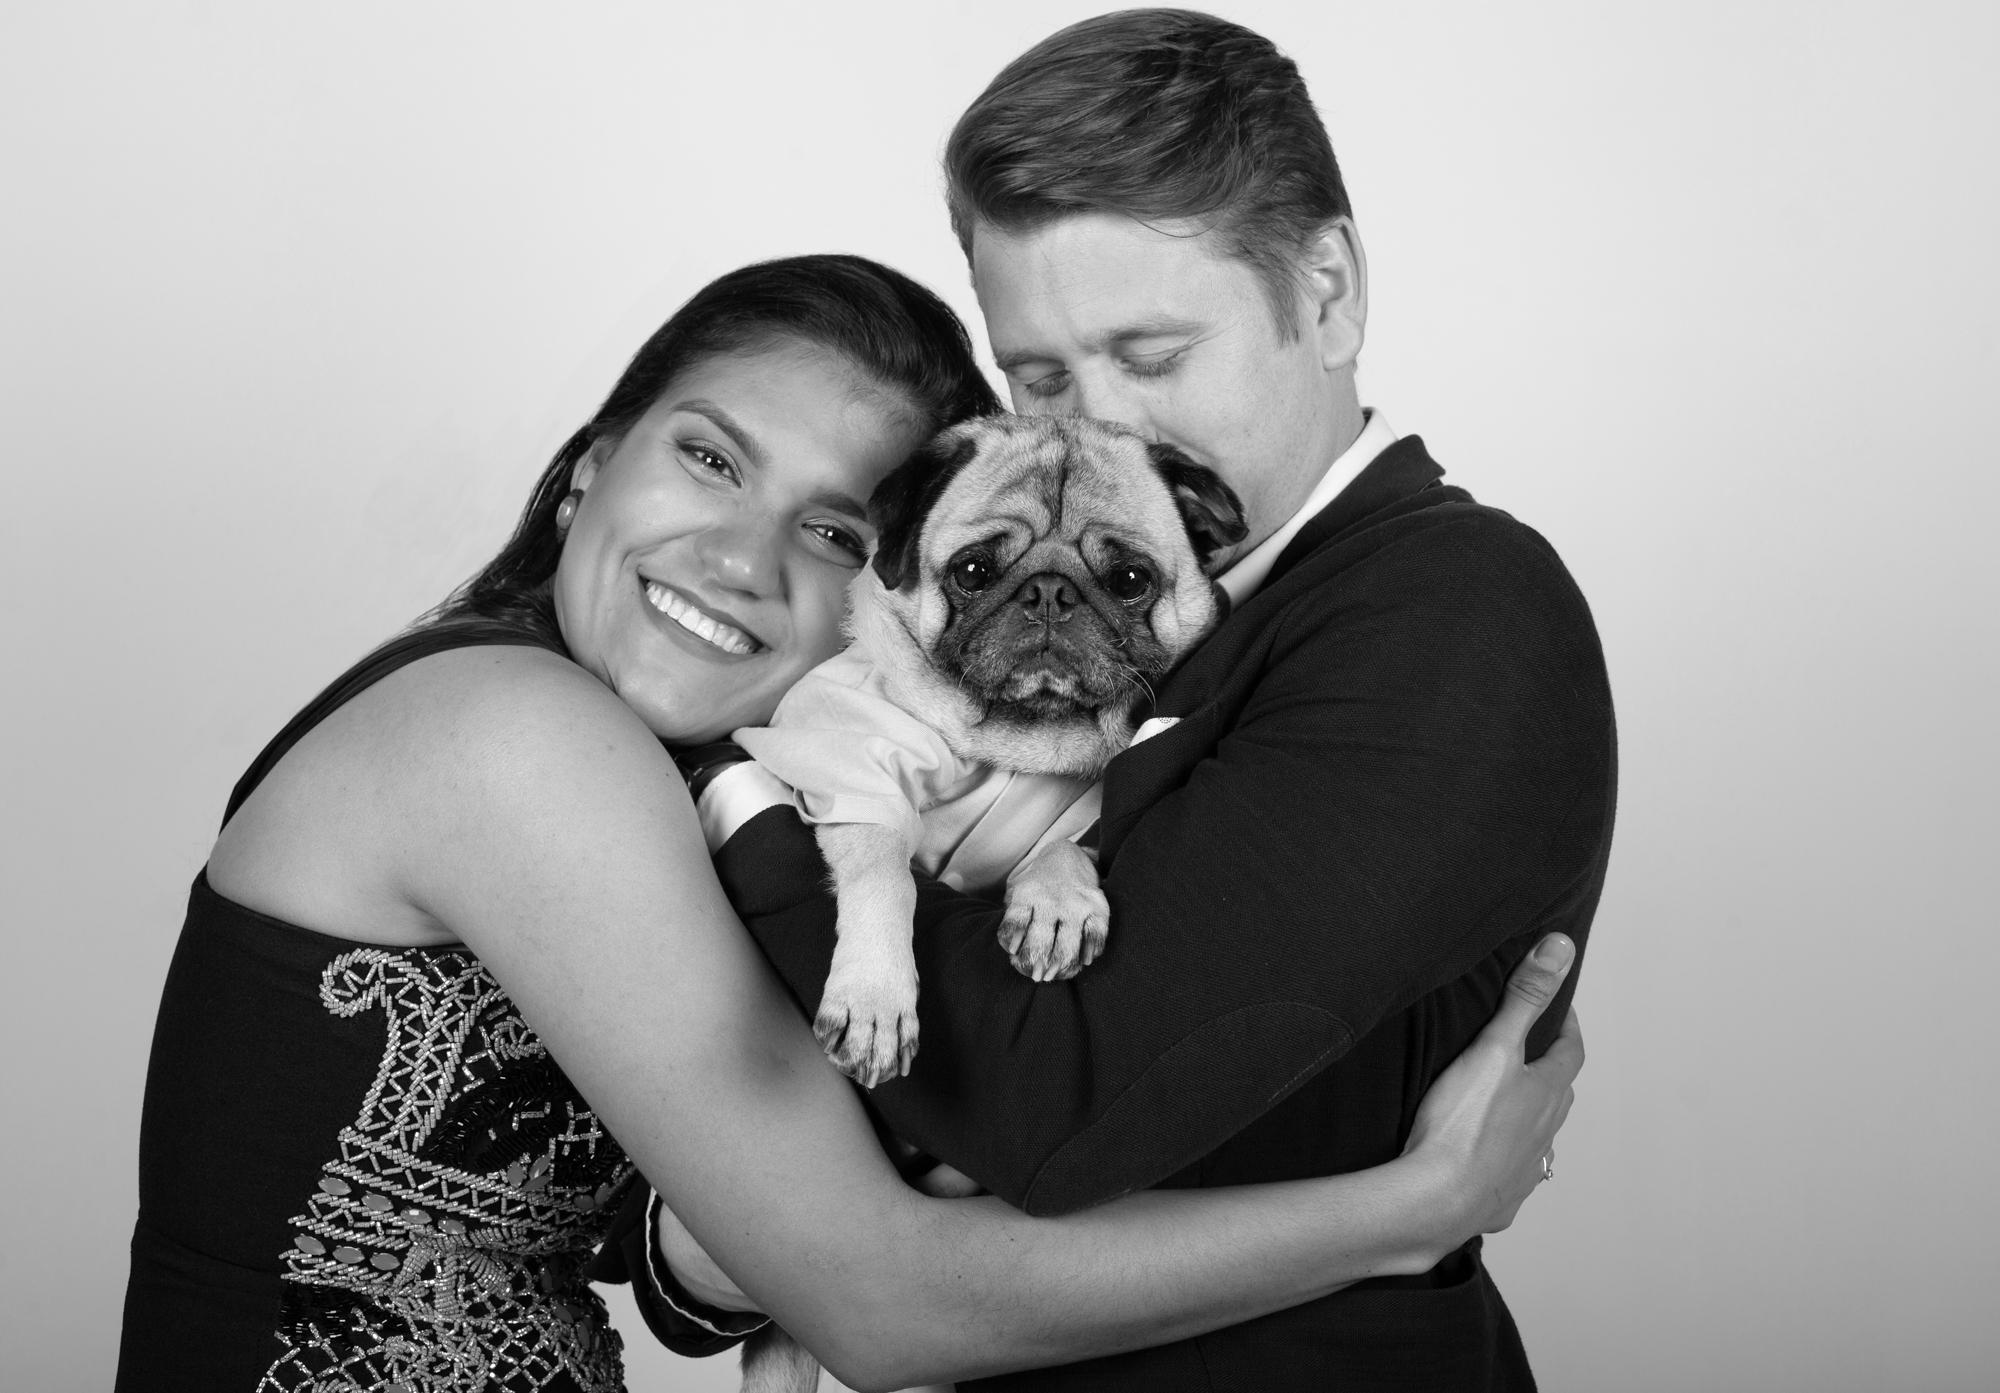 Sobre Estudio Fotografico, Fotógrafo de casamento, retratos corporativos